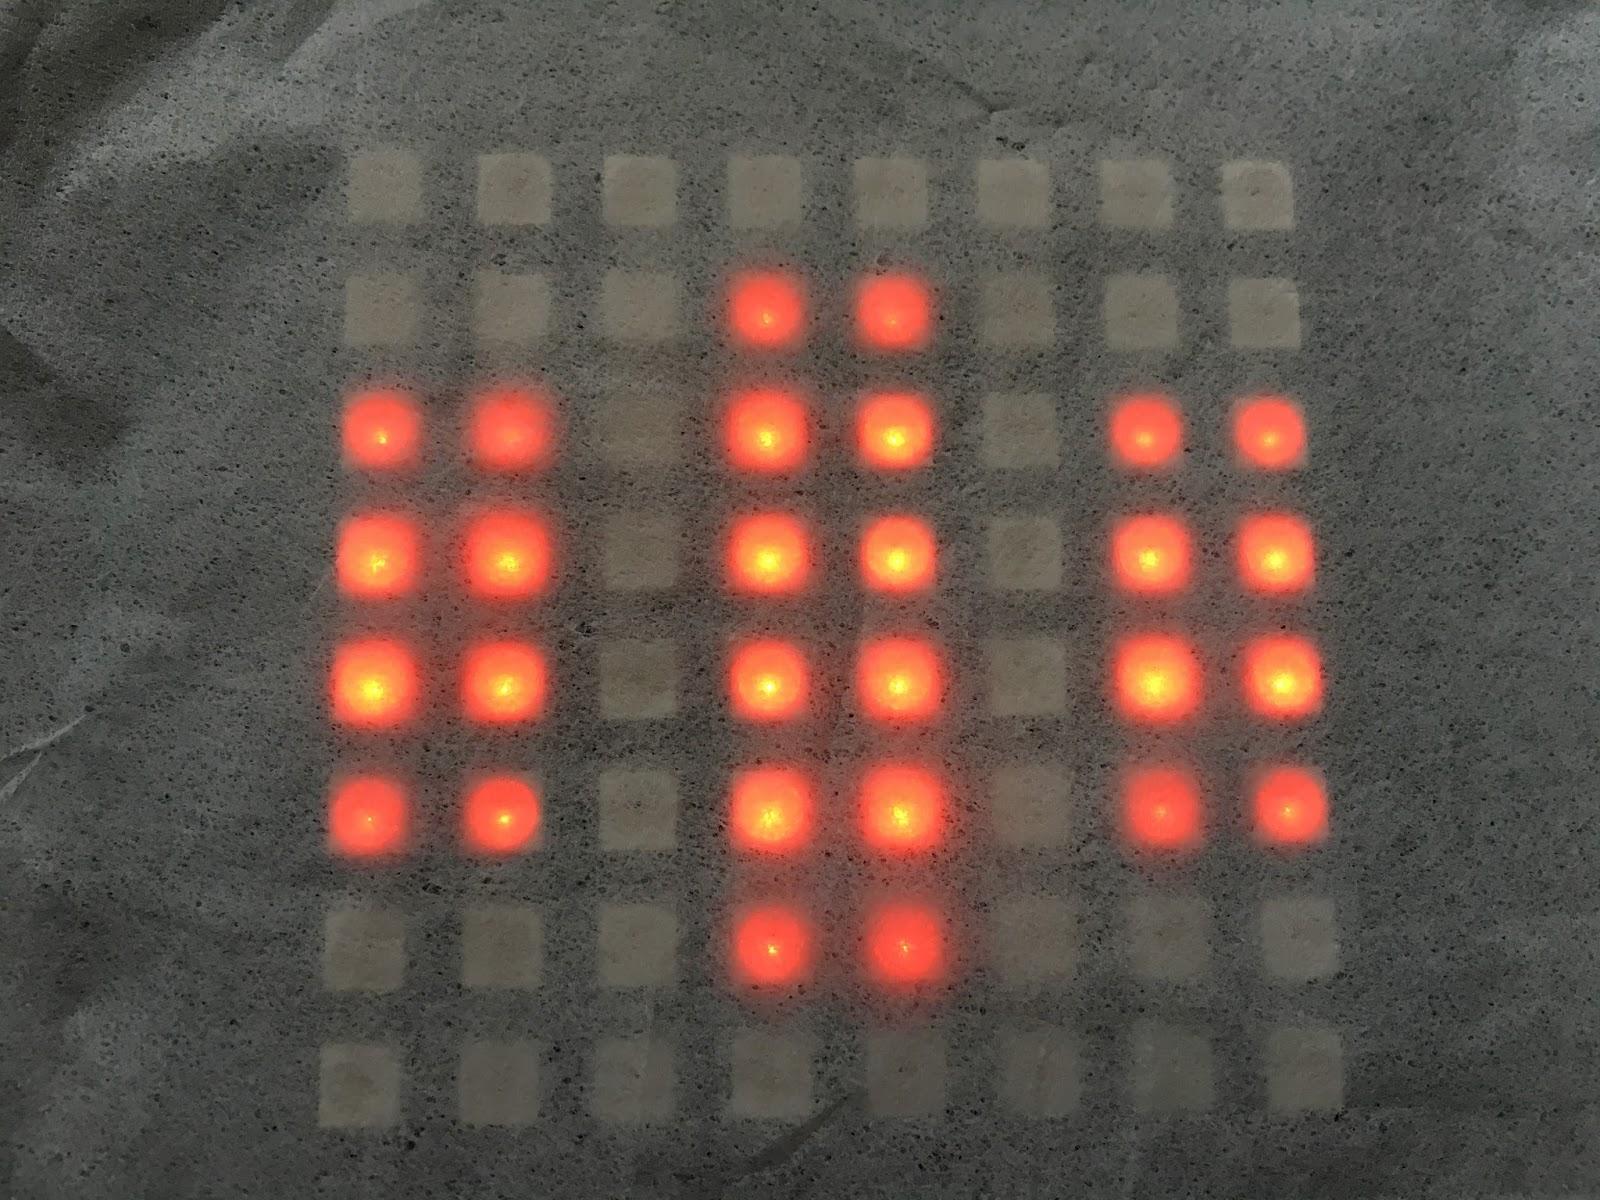 circuit diagram knight rider lights [ 1600 x 1200 Pixel ]